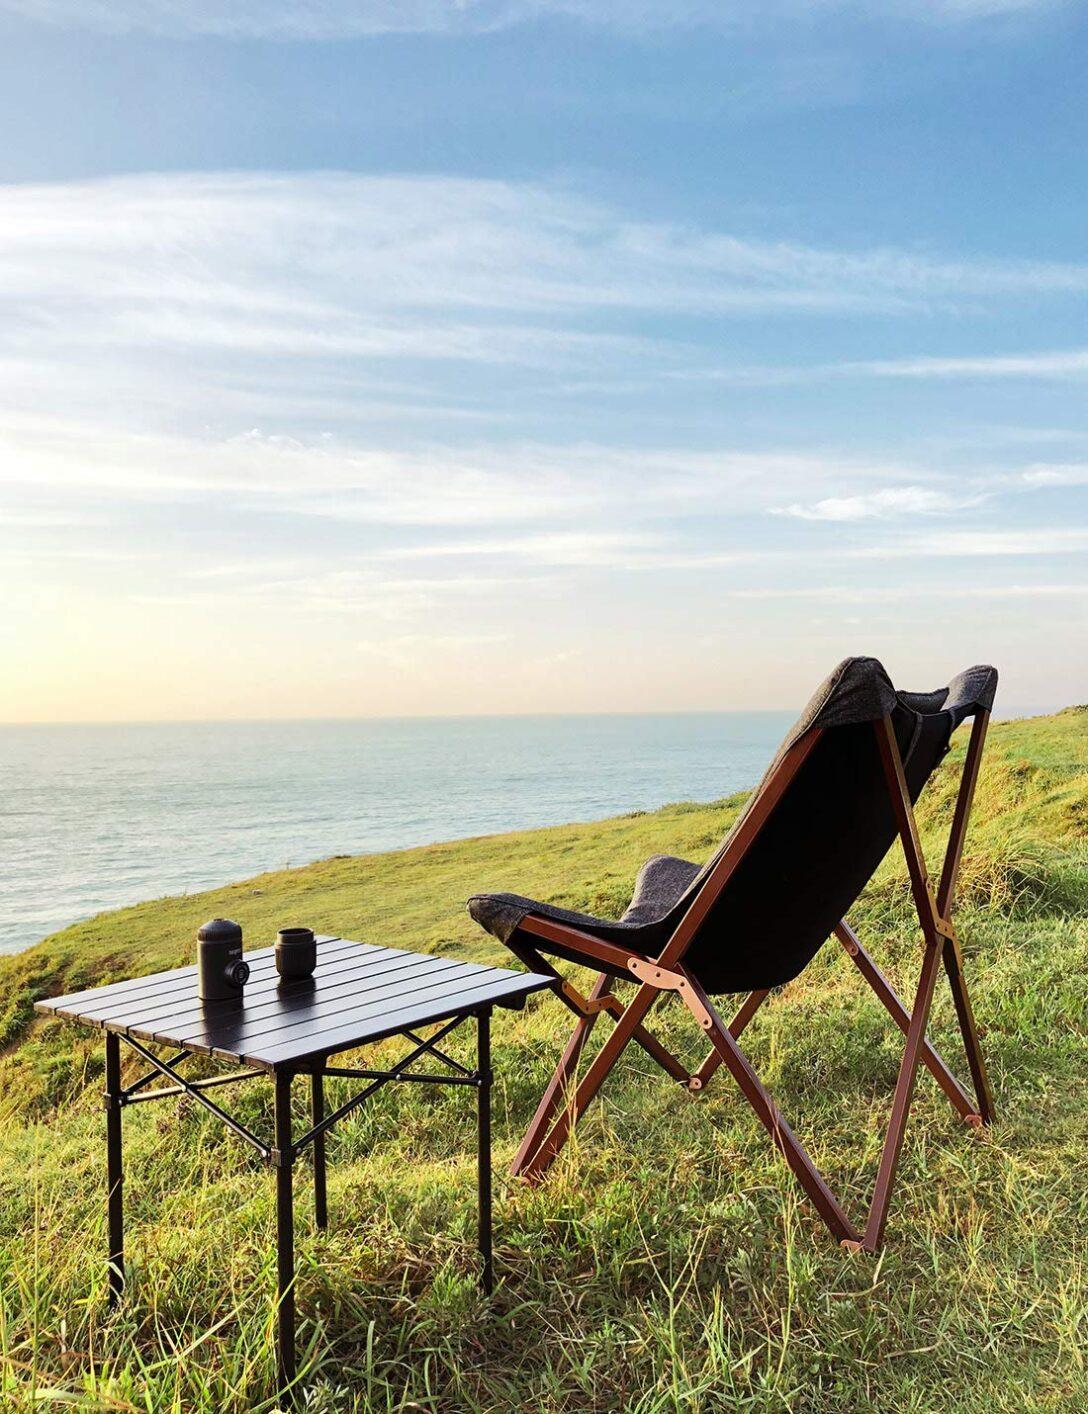 Large Size of Lounge Klappstuhl Green Klappsessel Gepolstert Suhu Camping Stuhl Sessel Modern Design Retro Möbel Garten Sofa Loungemöbel Holz Set Günstig Wohnzimmer Lounge Klappstuhl